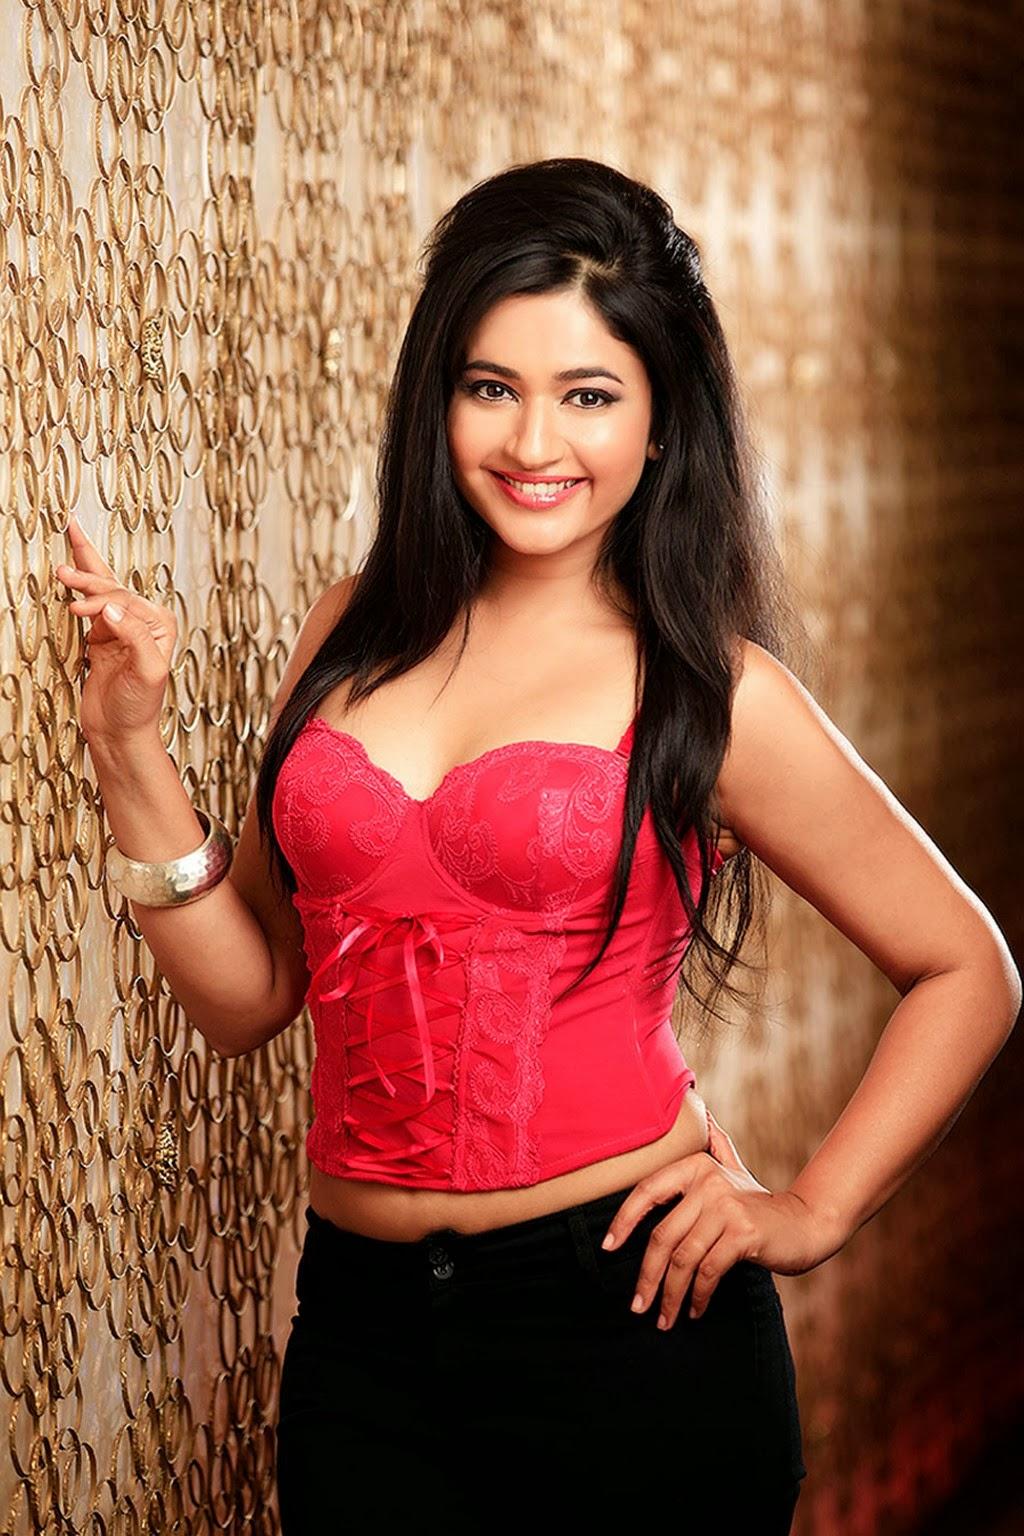 ... : Actress Poonam Bajwa Hot Cleavage Navel Thunder Thigh Photo Gallery